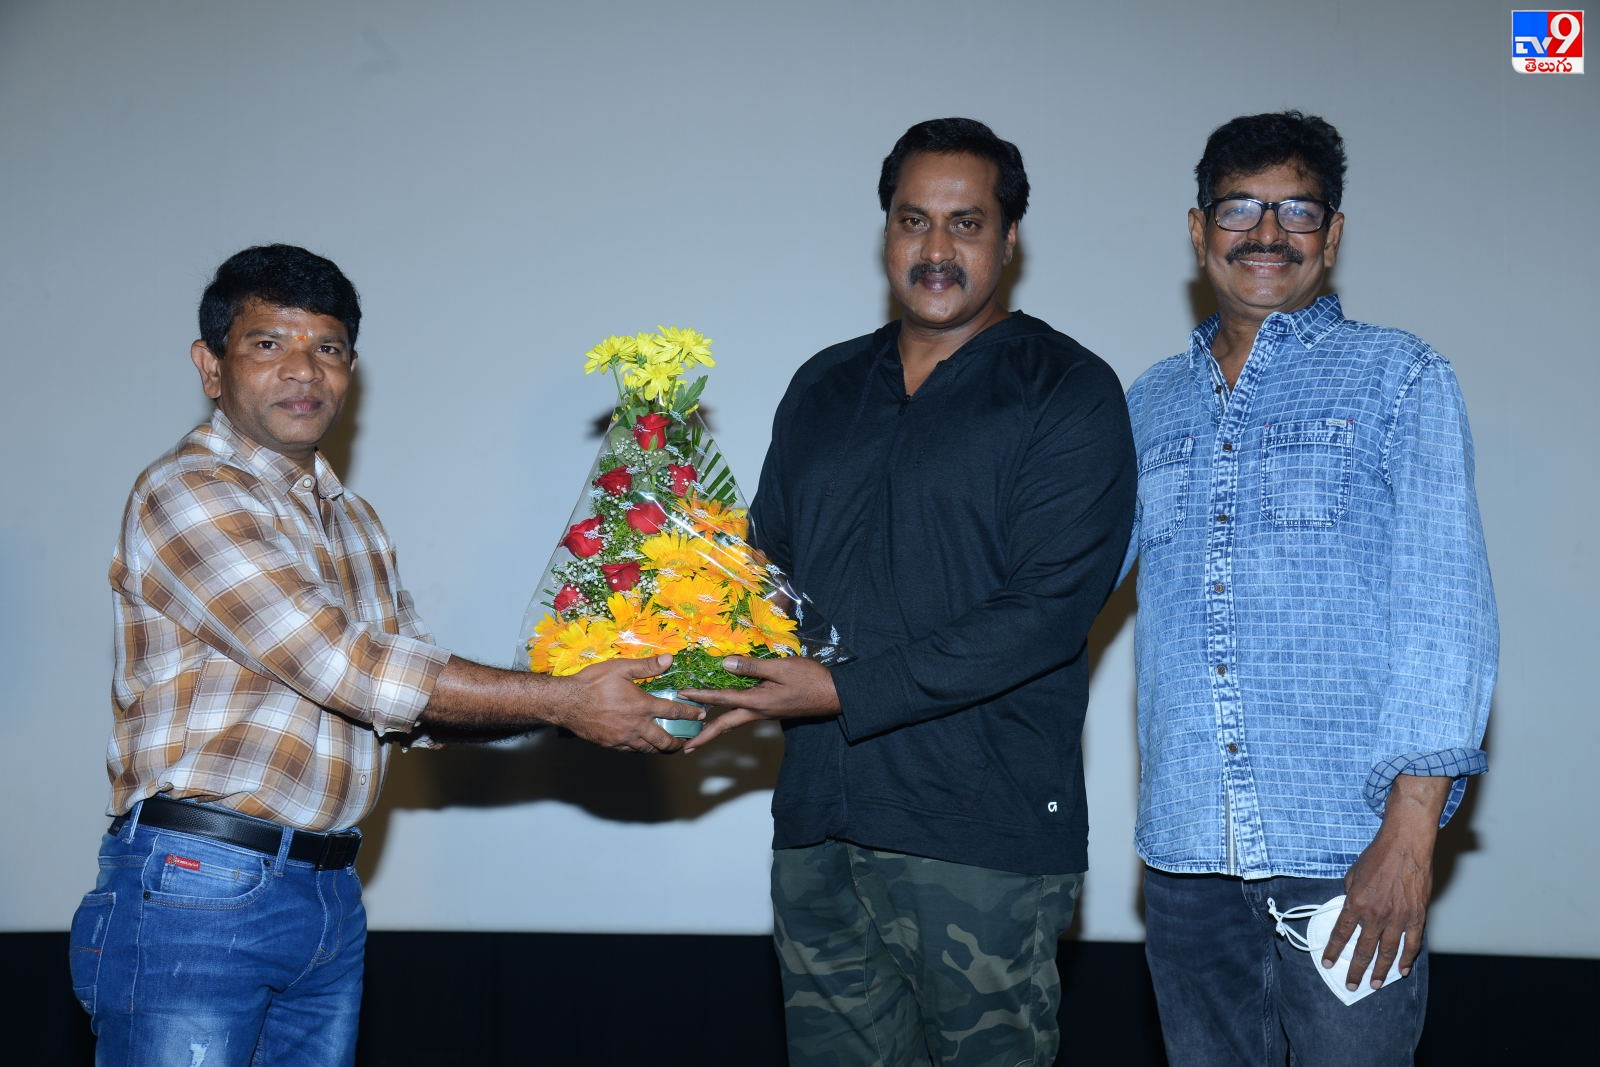 Veyi Subhamulu Kalugu neeku, 'వేయి శుభములు కలుగు నీకు' టీజర్ ను విడుదల చేసిన హీరో సునీల్